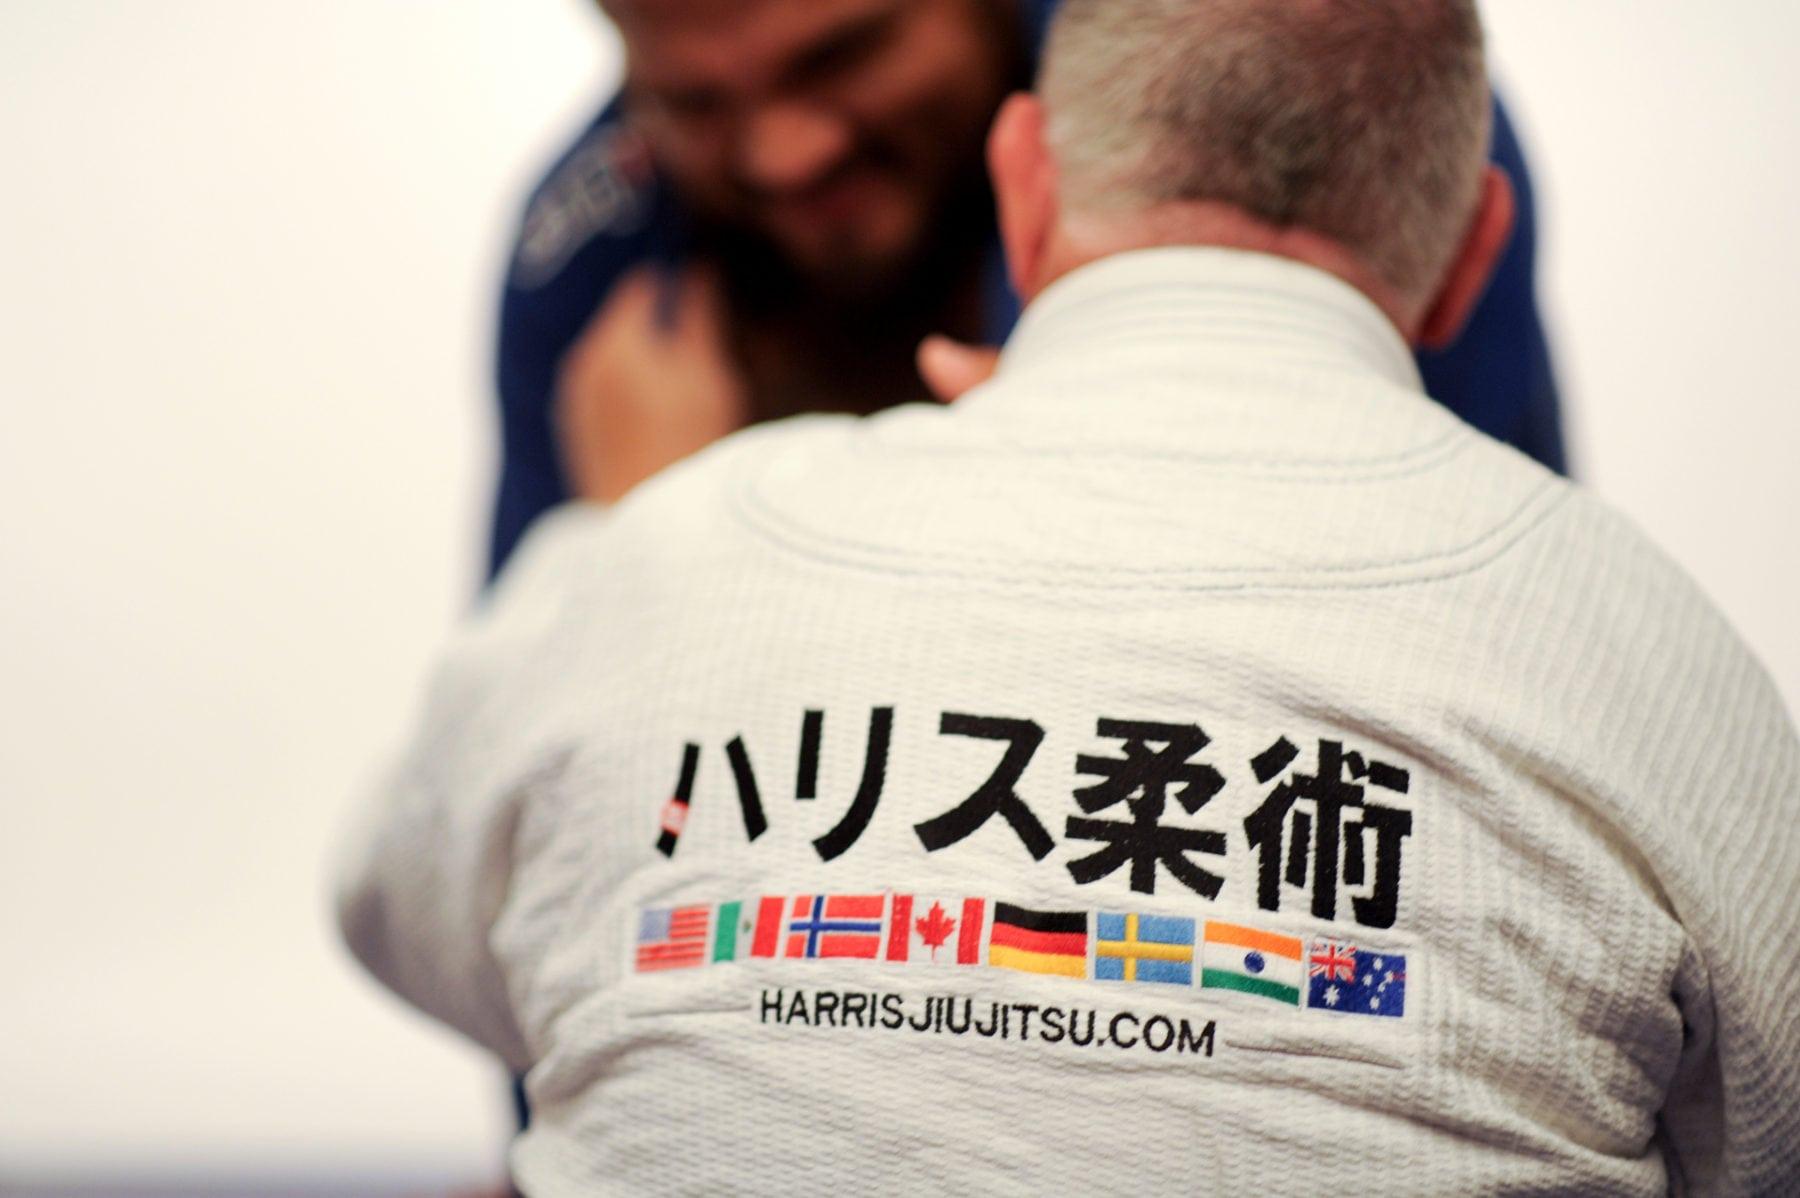 Roy Harris Jiu Jitsu